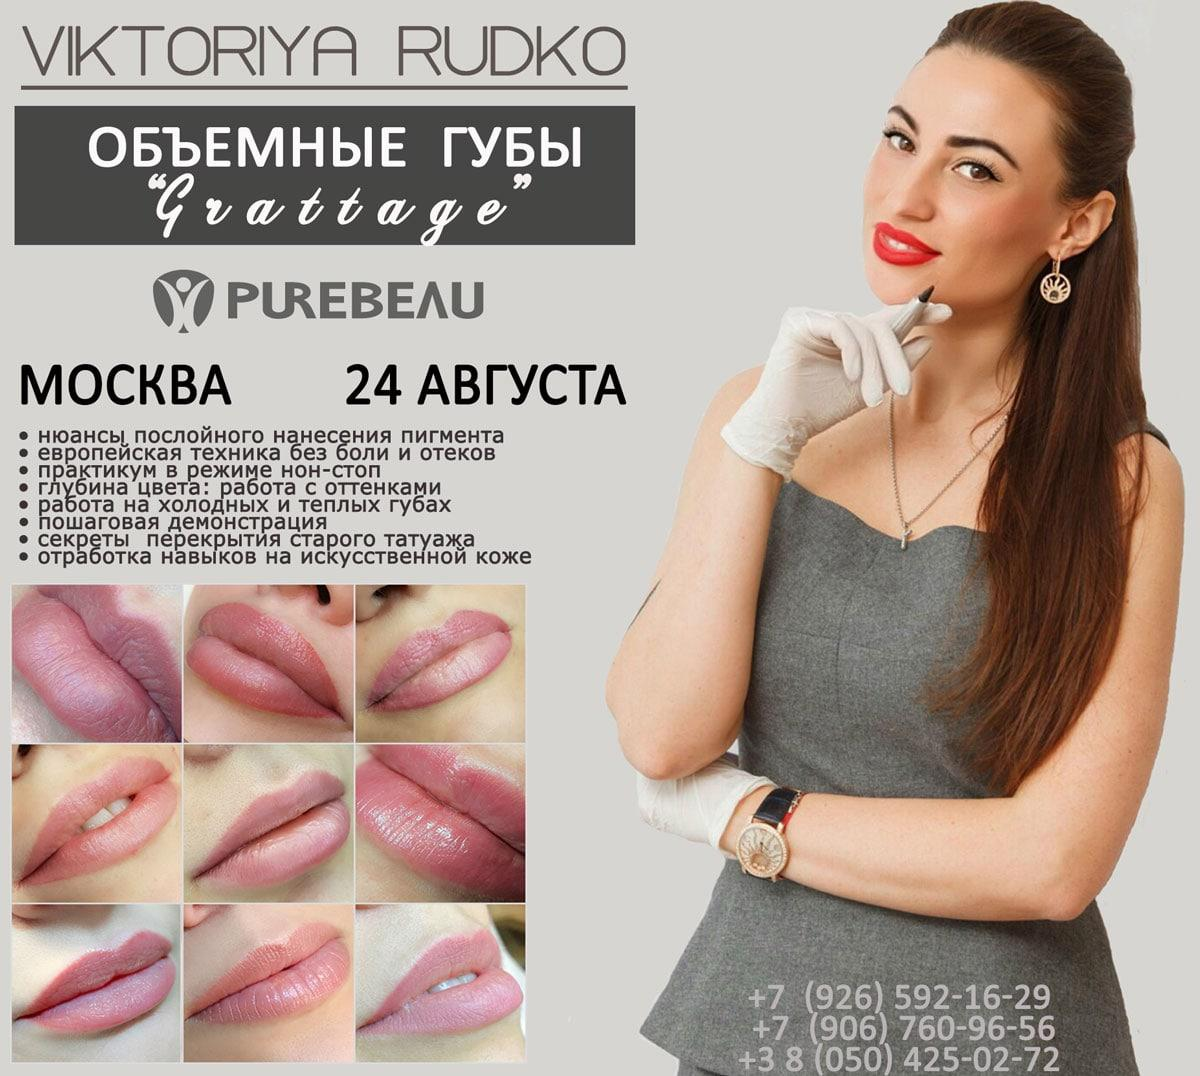 Мастер-класс по татуажу губ в технике Grattage от Виктории Рудько  24 августа. Москва